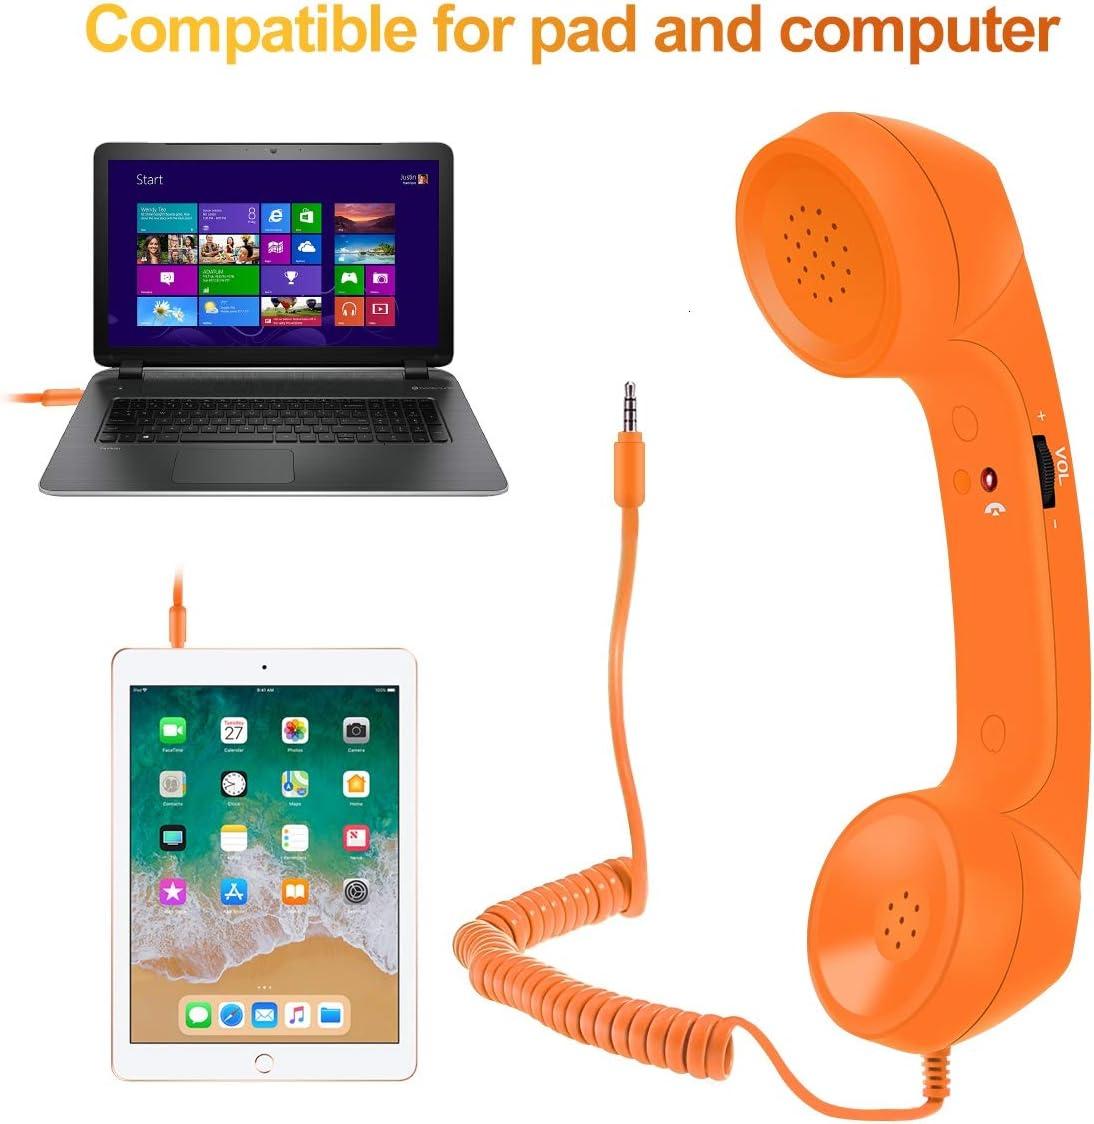 Cell Phone Handset Retro Telephone Handset Radiation Proof Handset Receiver 3.5mm for iPhone Computer Smartphone Orange Feeko Retro Handset iPad